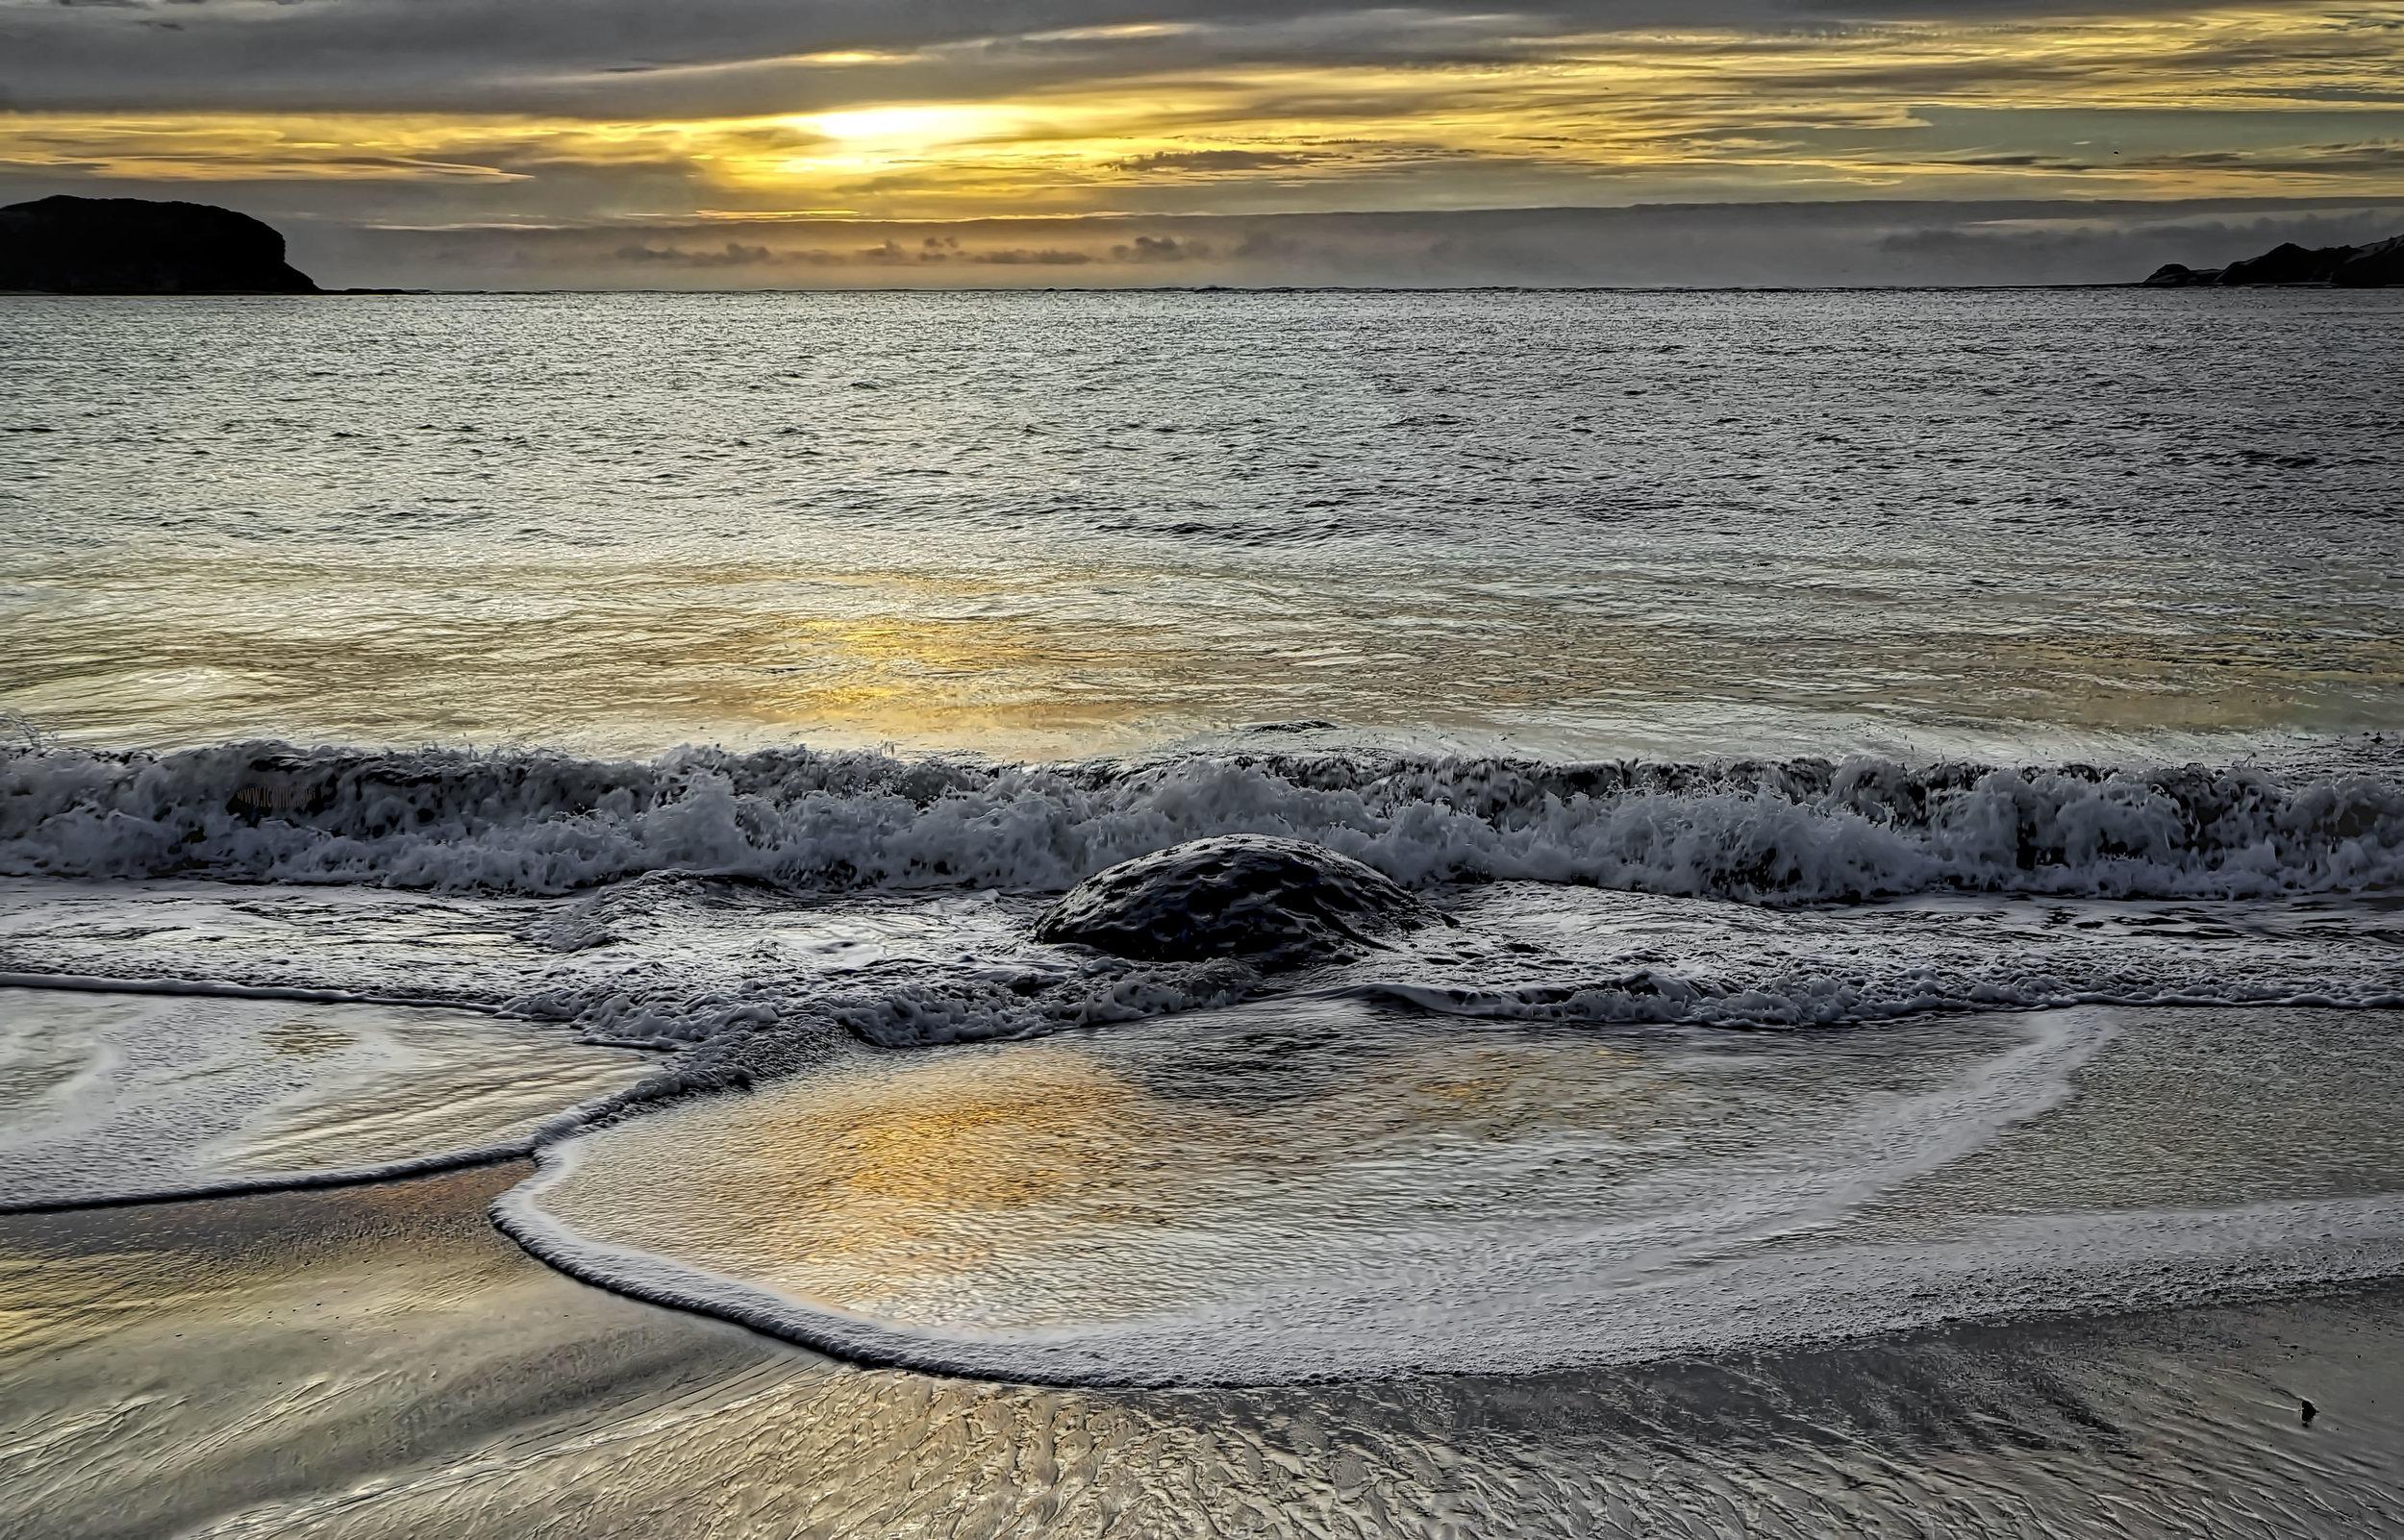 Omāpere beach sunset, Northland, New Zealand